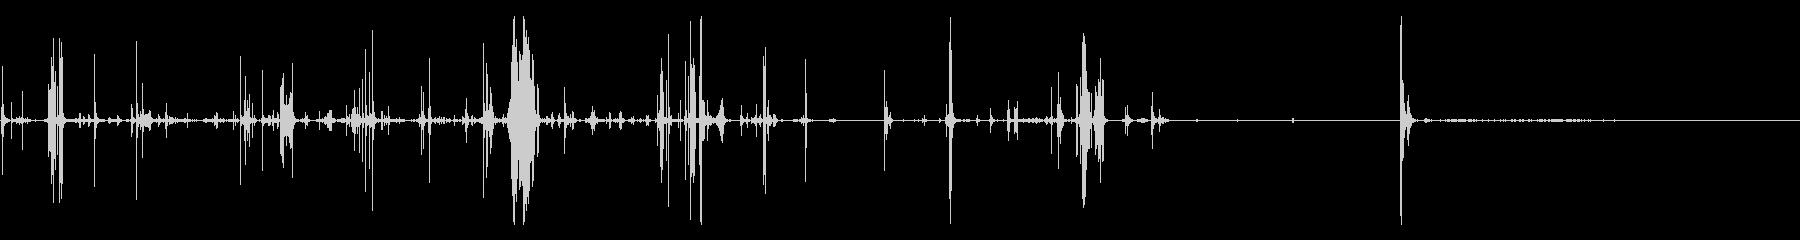 UNWRAP、POP CORK、F...の未再生の波形